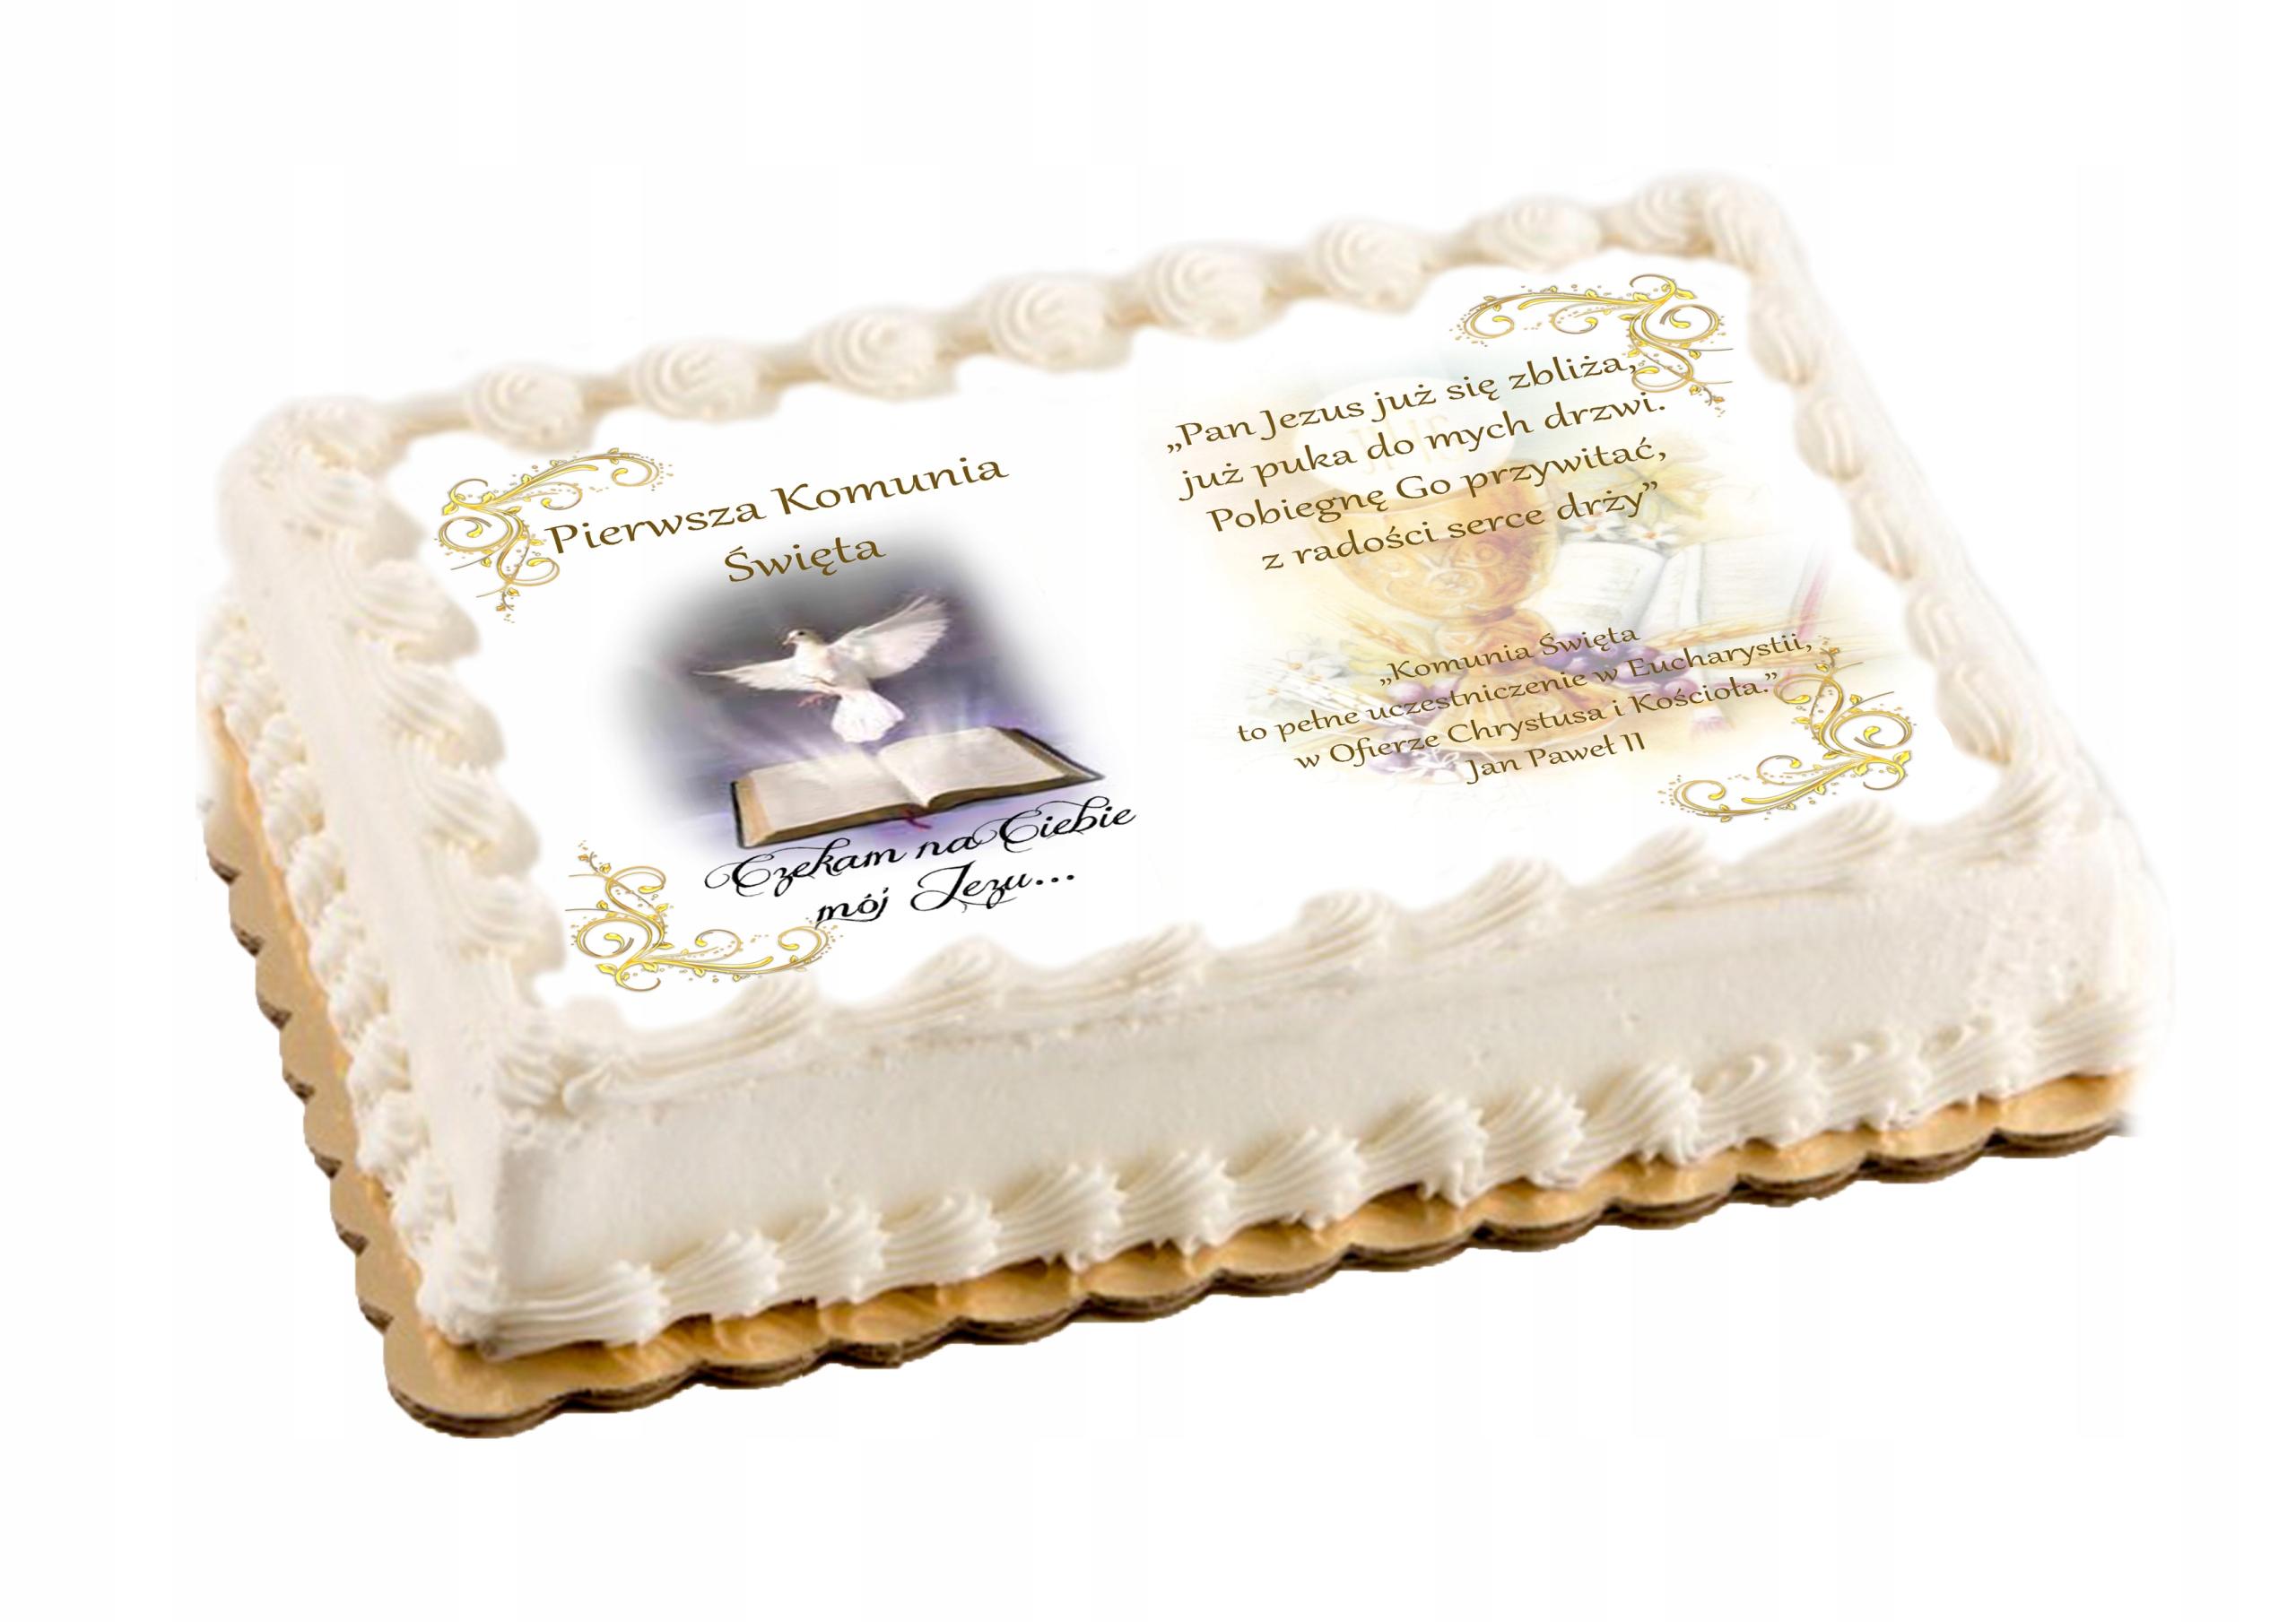 Oplatek Na Tort Komunijny Na Komunie Duzy A4 Napis 7837066817 Allegro Pl